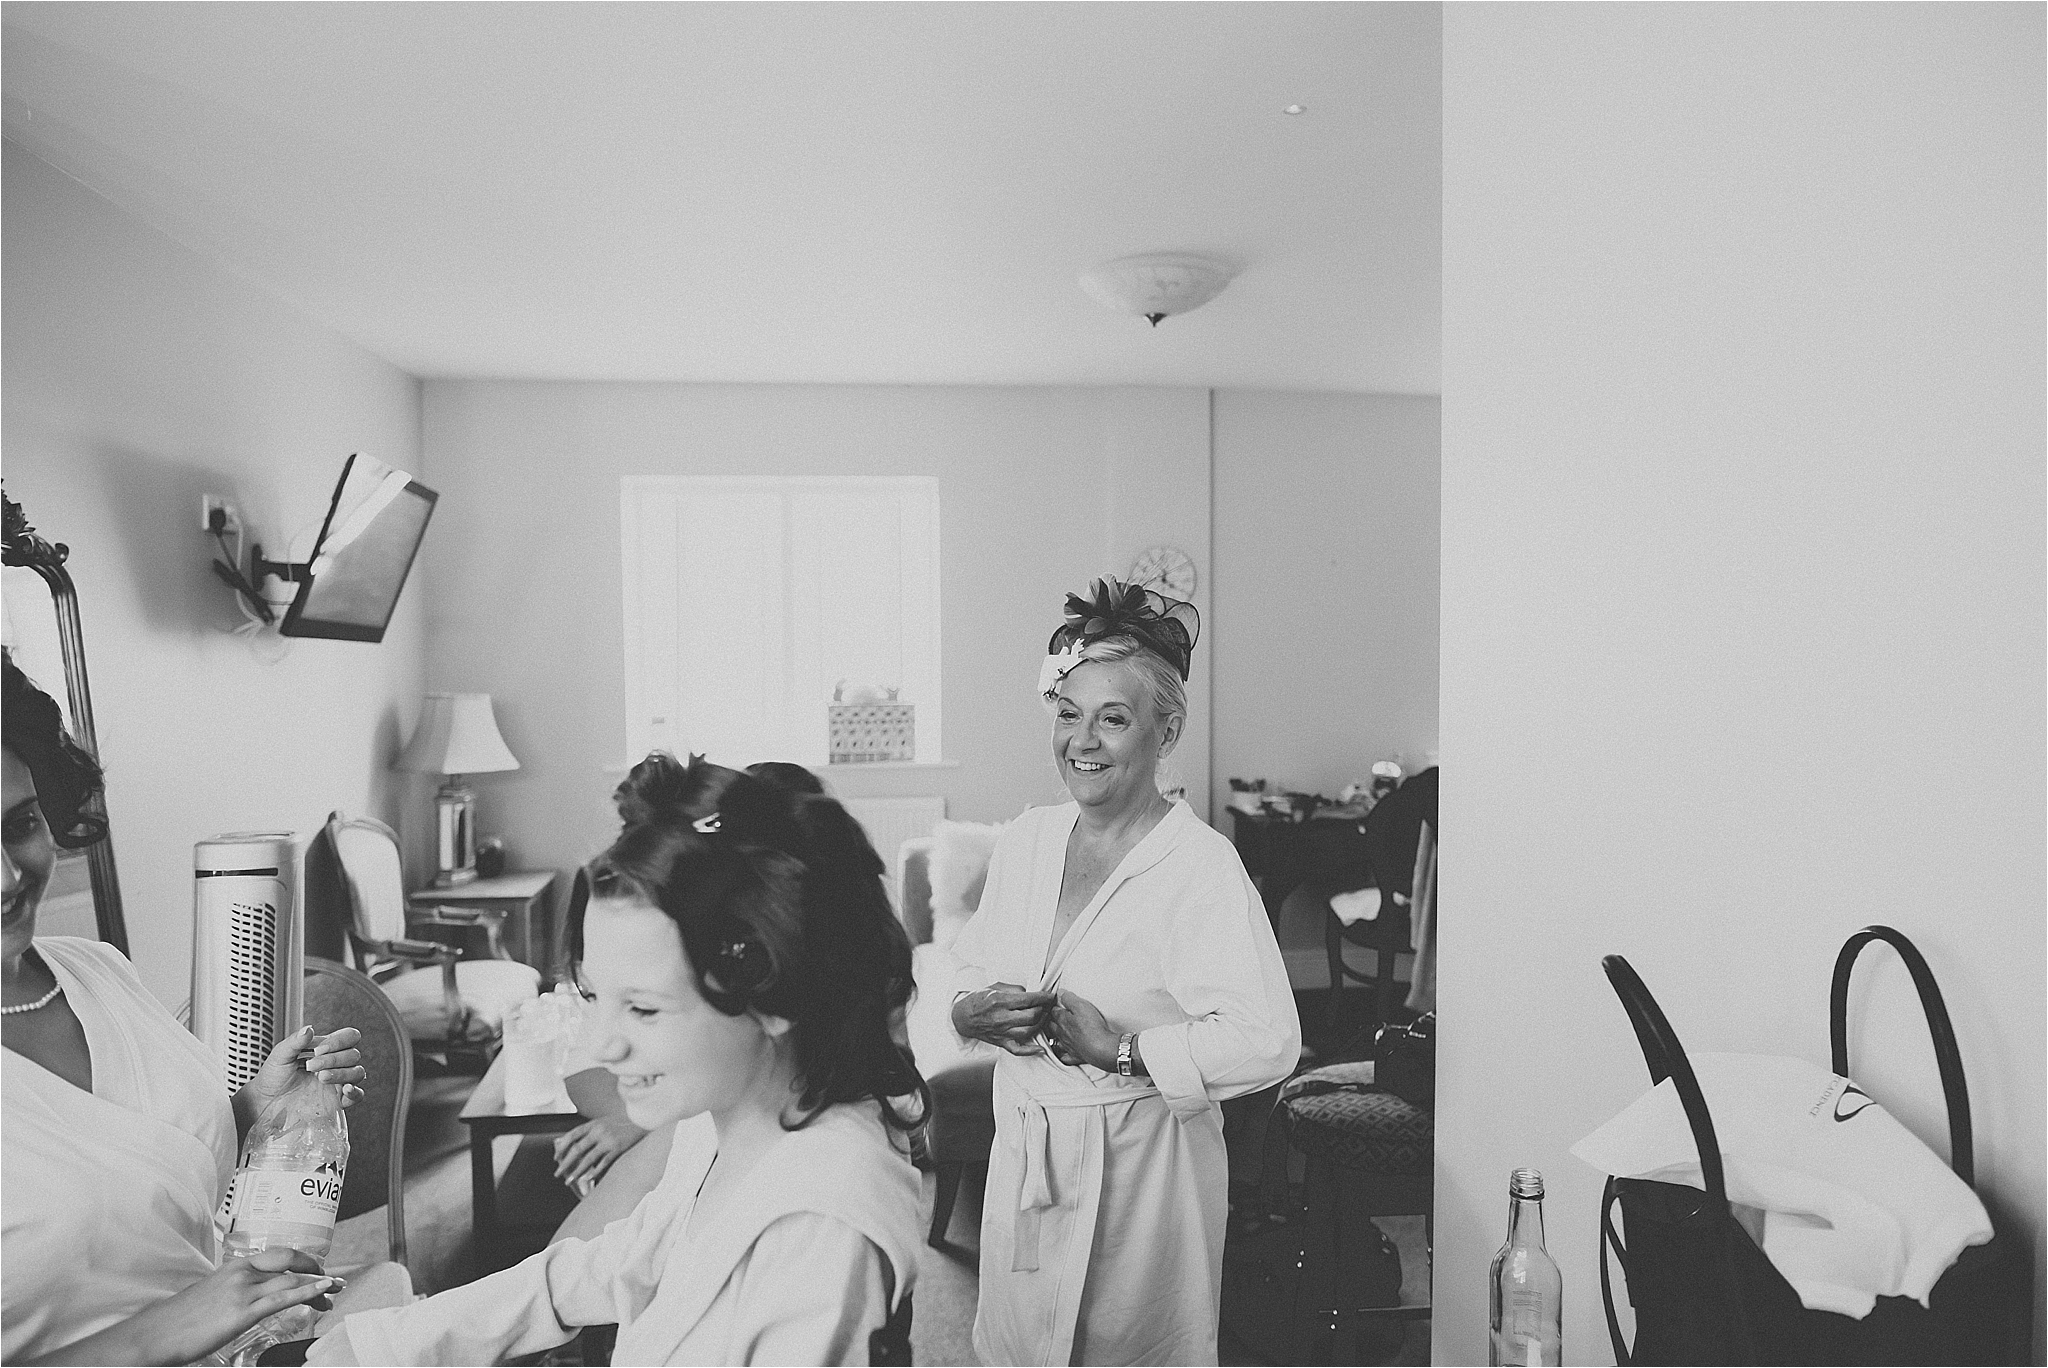 thevilla+lancashire+wreagreen+wedding+photographer80.jpg